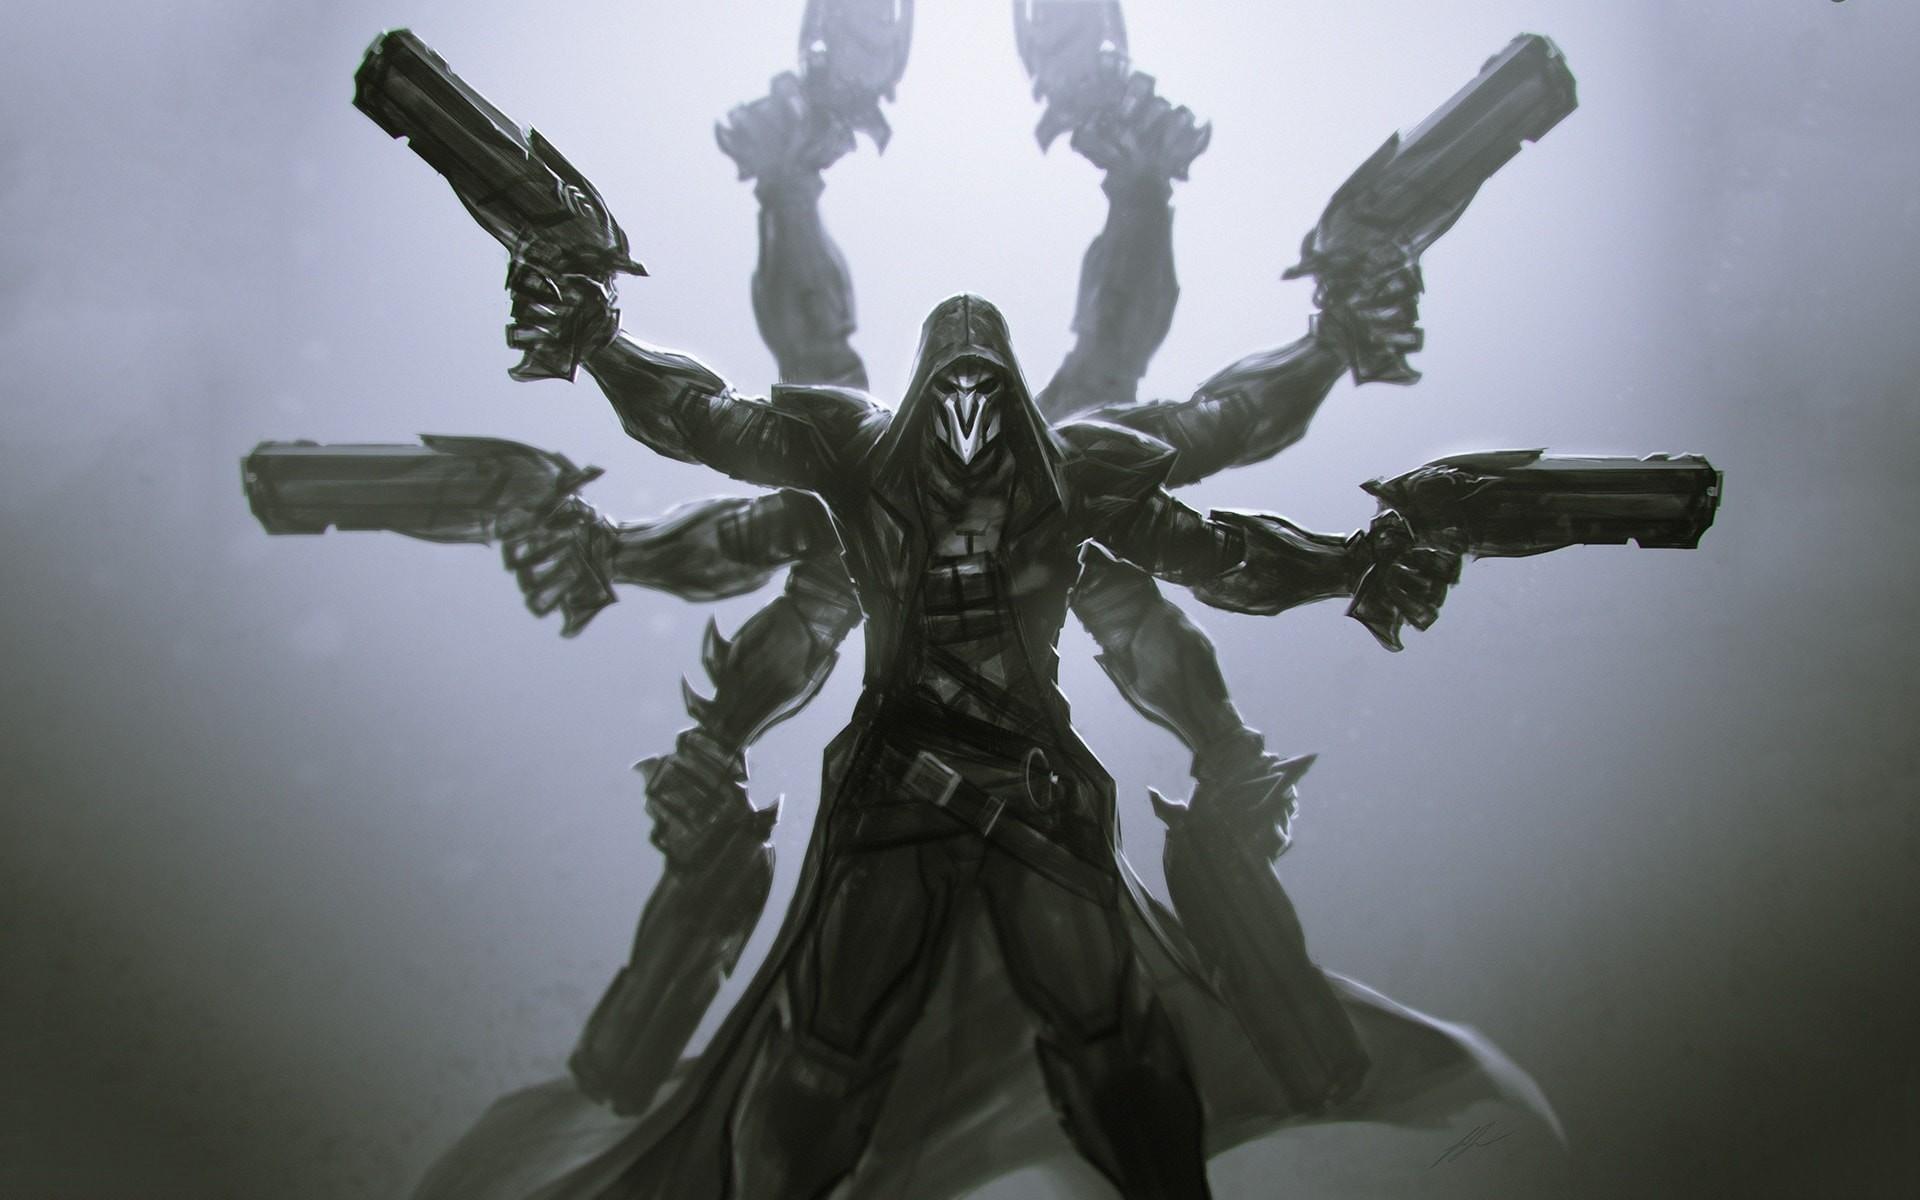 Overwatch reaper wallpapers 83 images - Reaper wallpaper ...